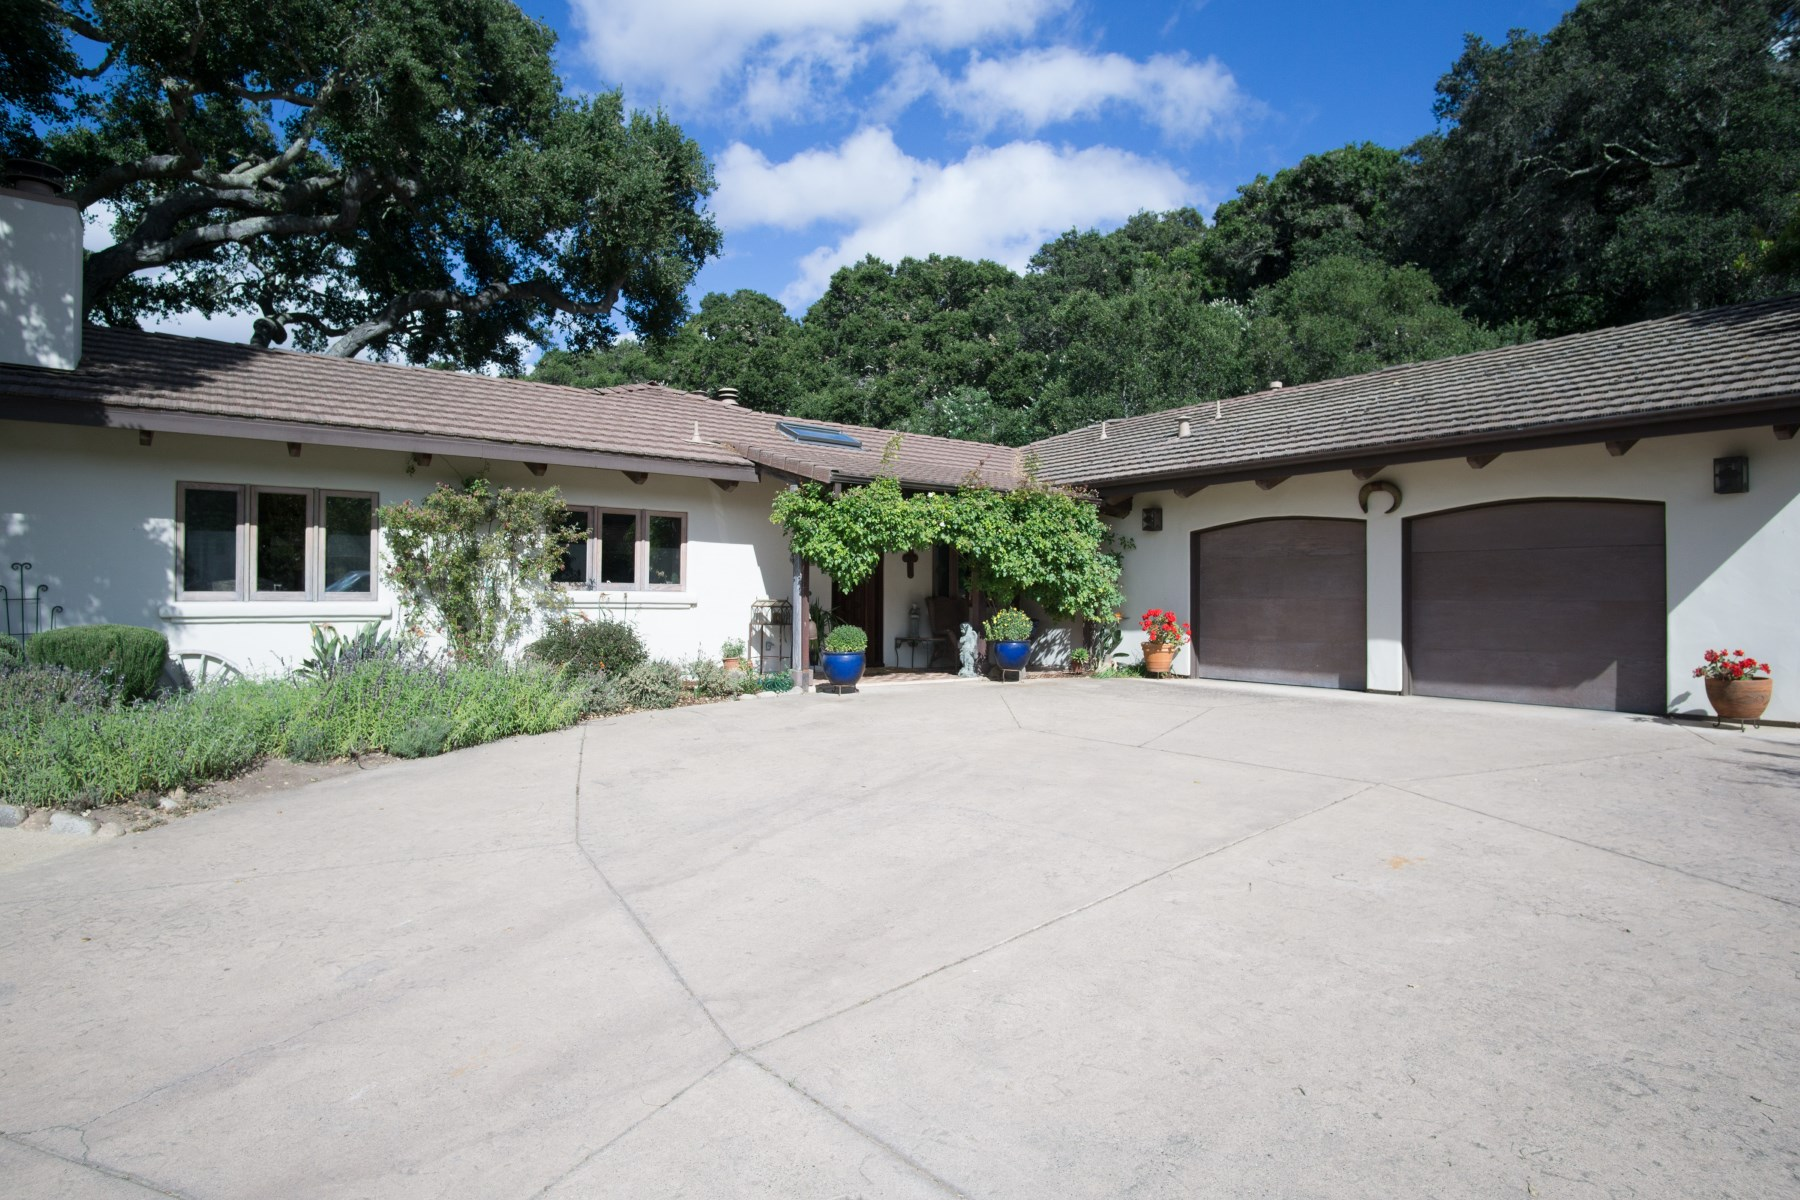 Casa para uma família para Venda às Enchanted Hacienda Style Executive Home 4 Rancho El Robledo Carmel Valley, Califórnia, 93924 Estados Unidos